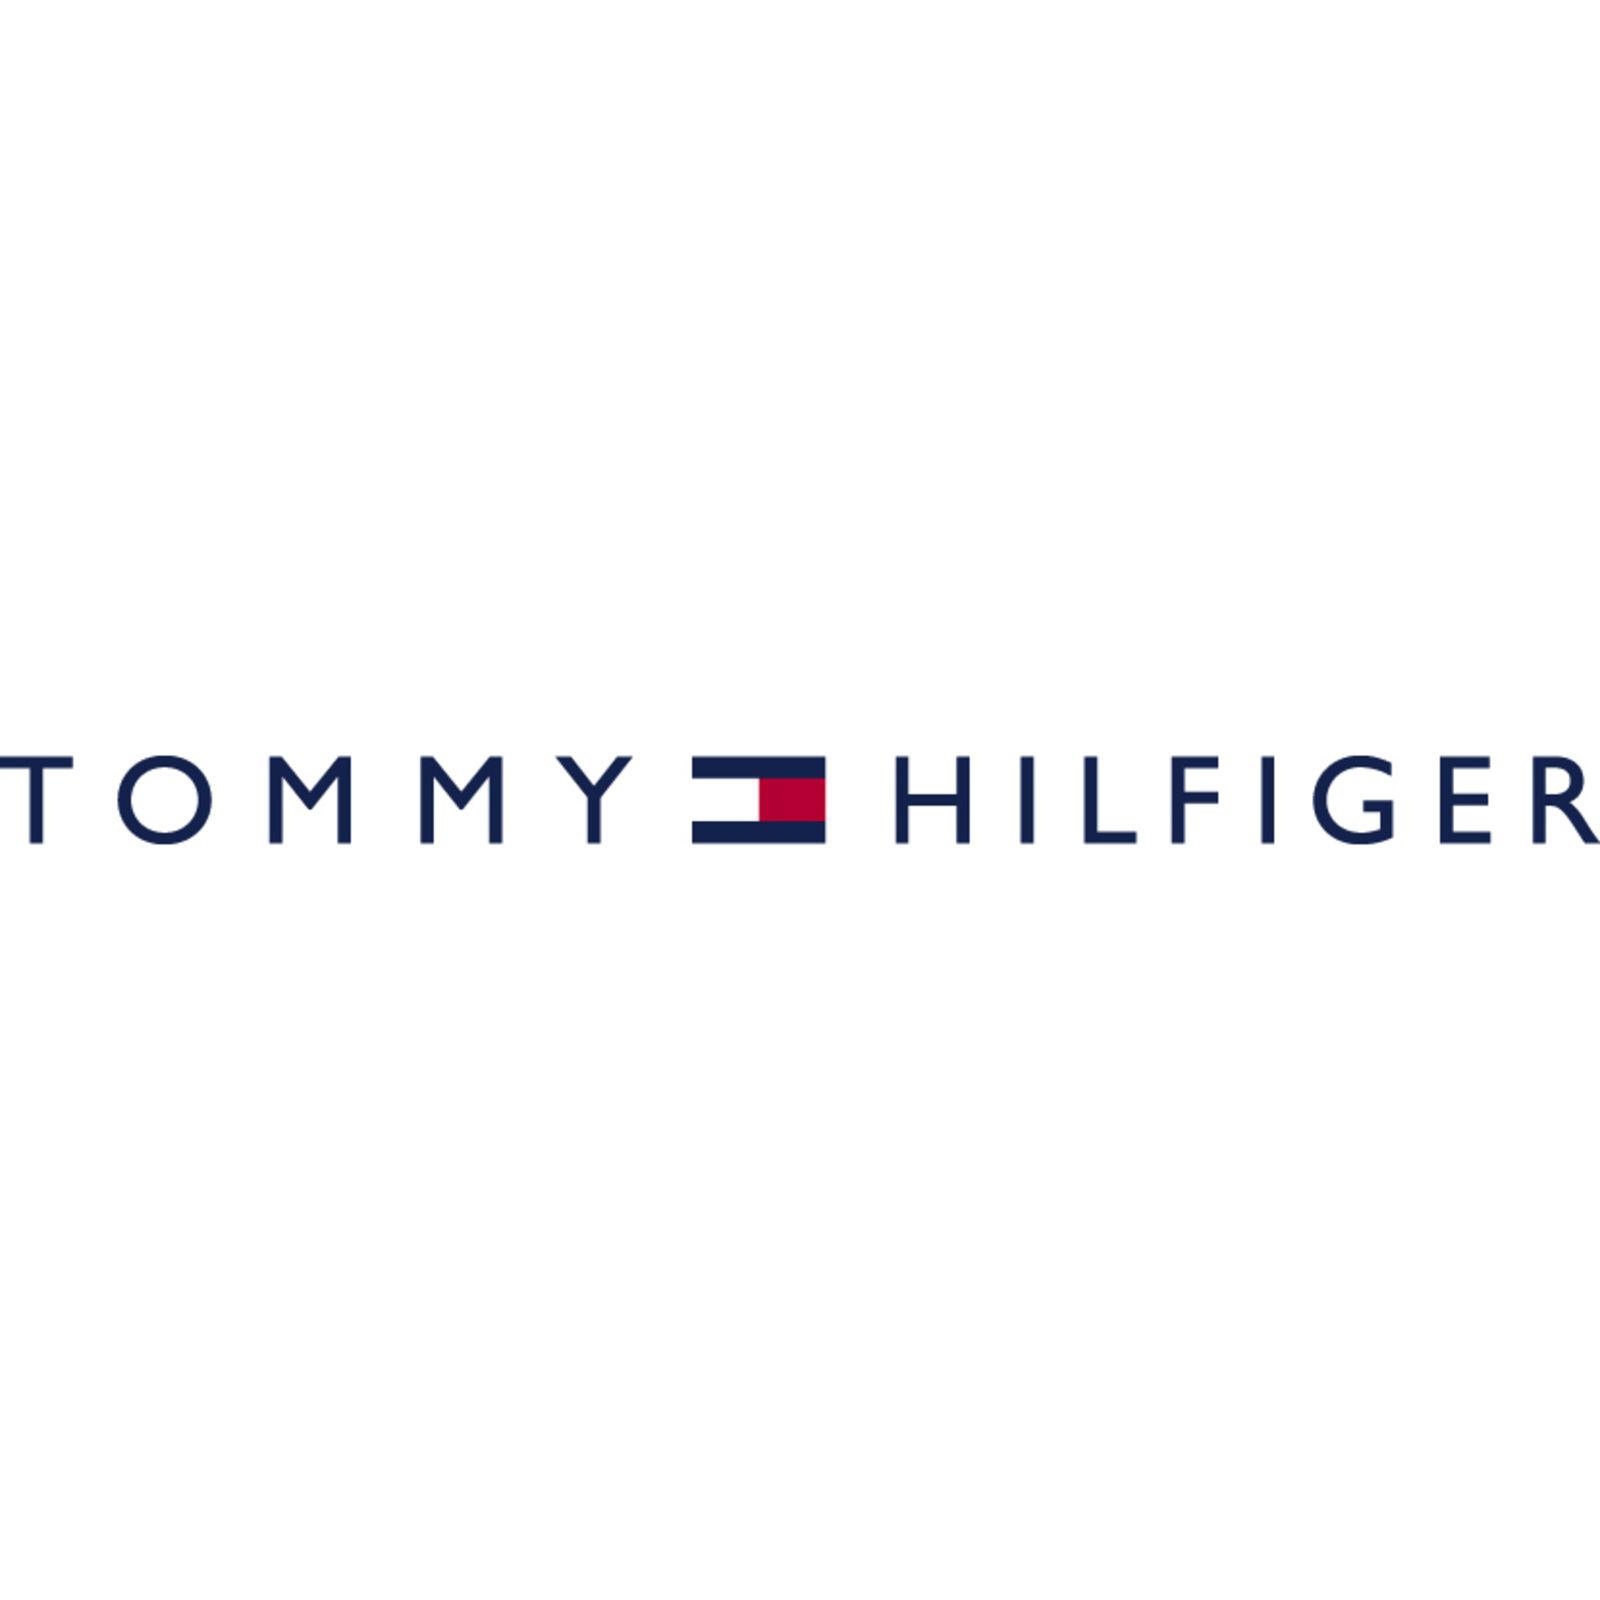 TOMMY HILFIGER STORE in Berlin (Bild 2)